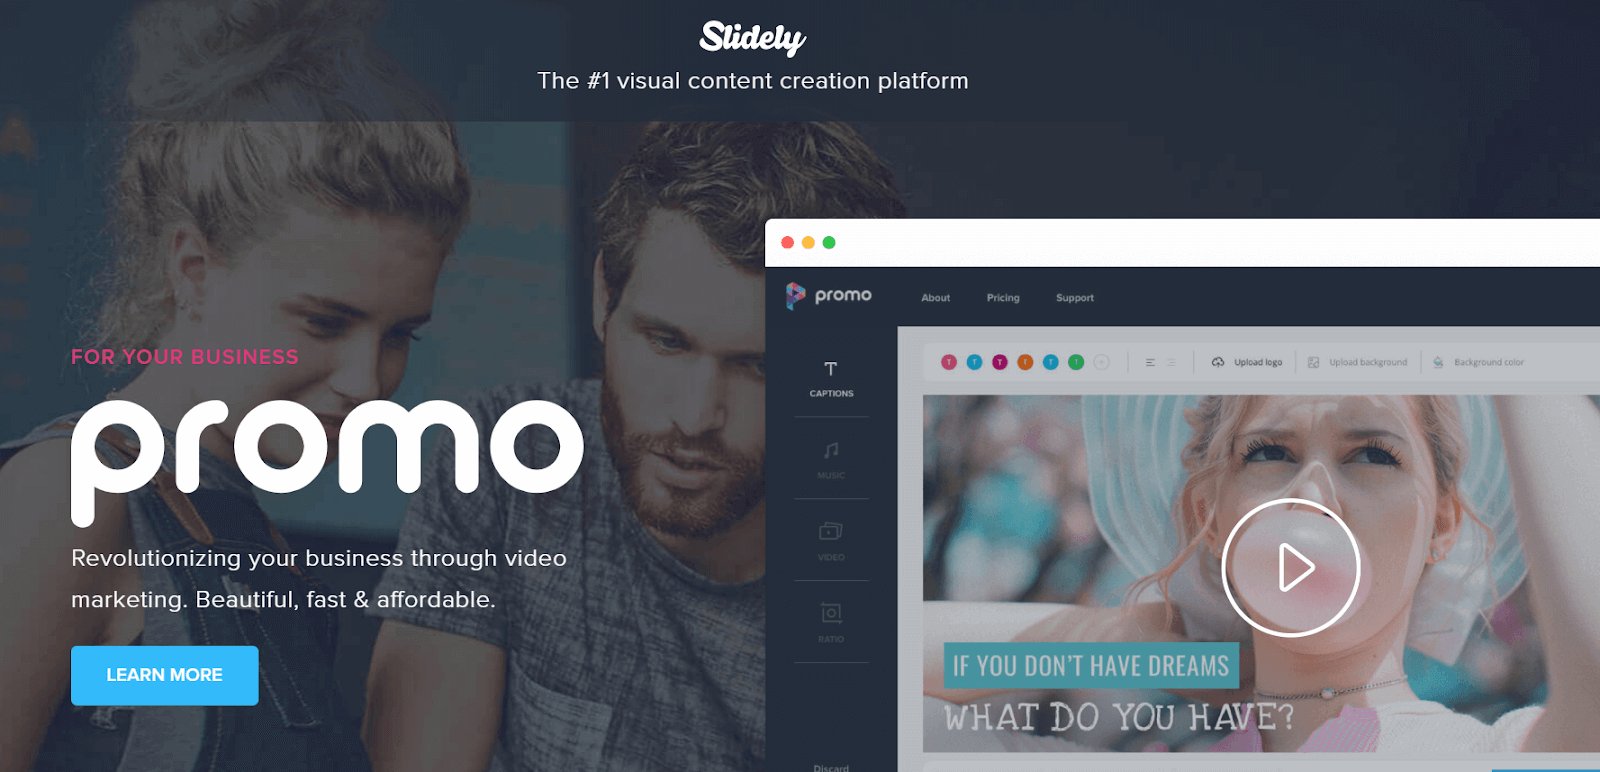 Slidely Video Marketing Tool